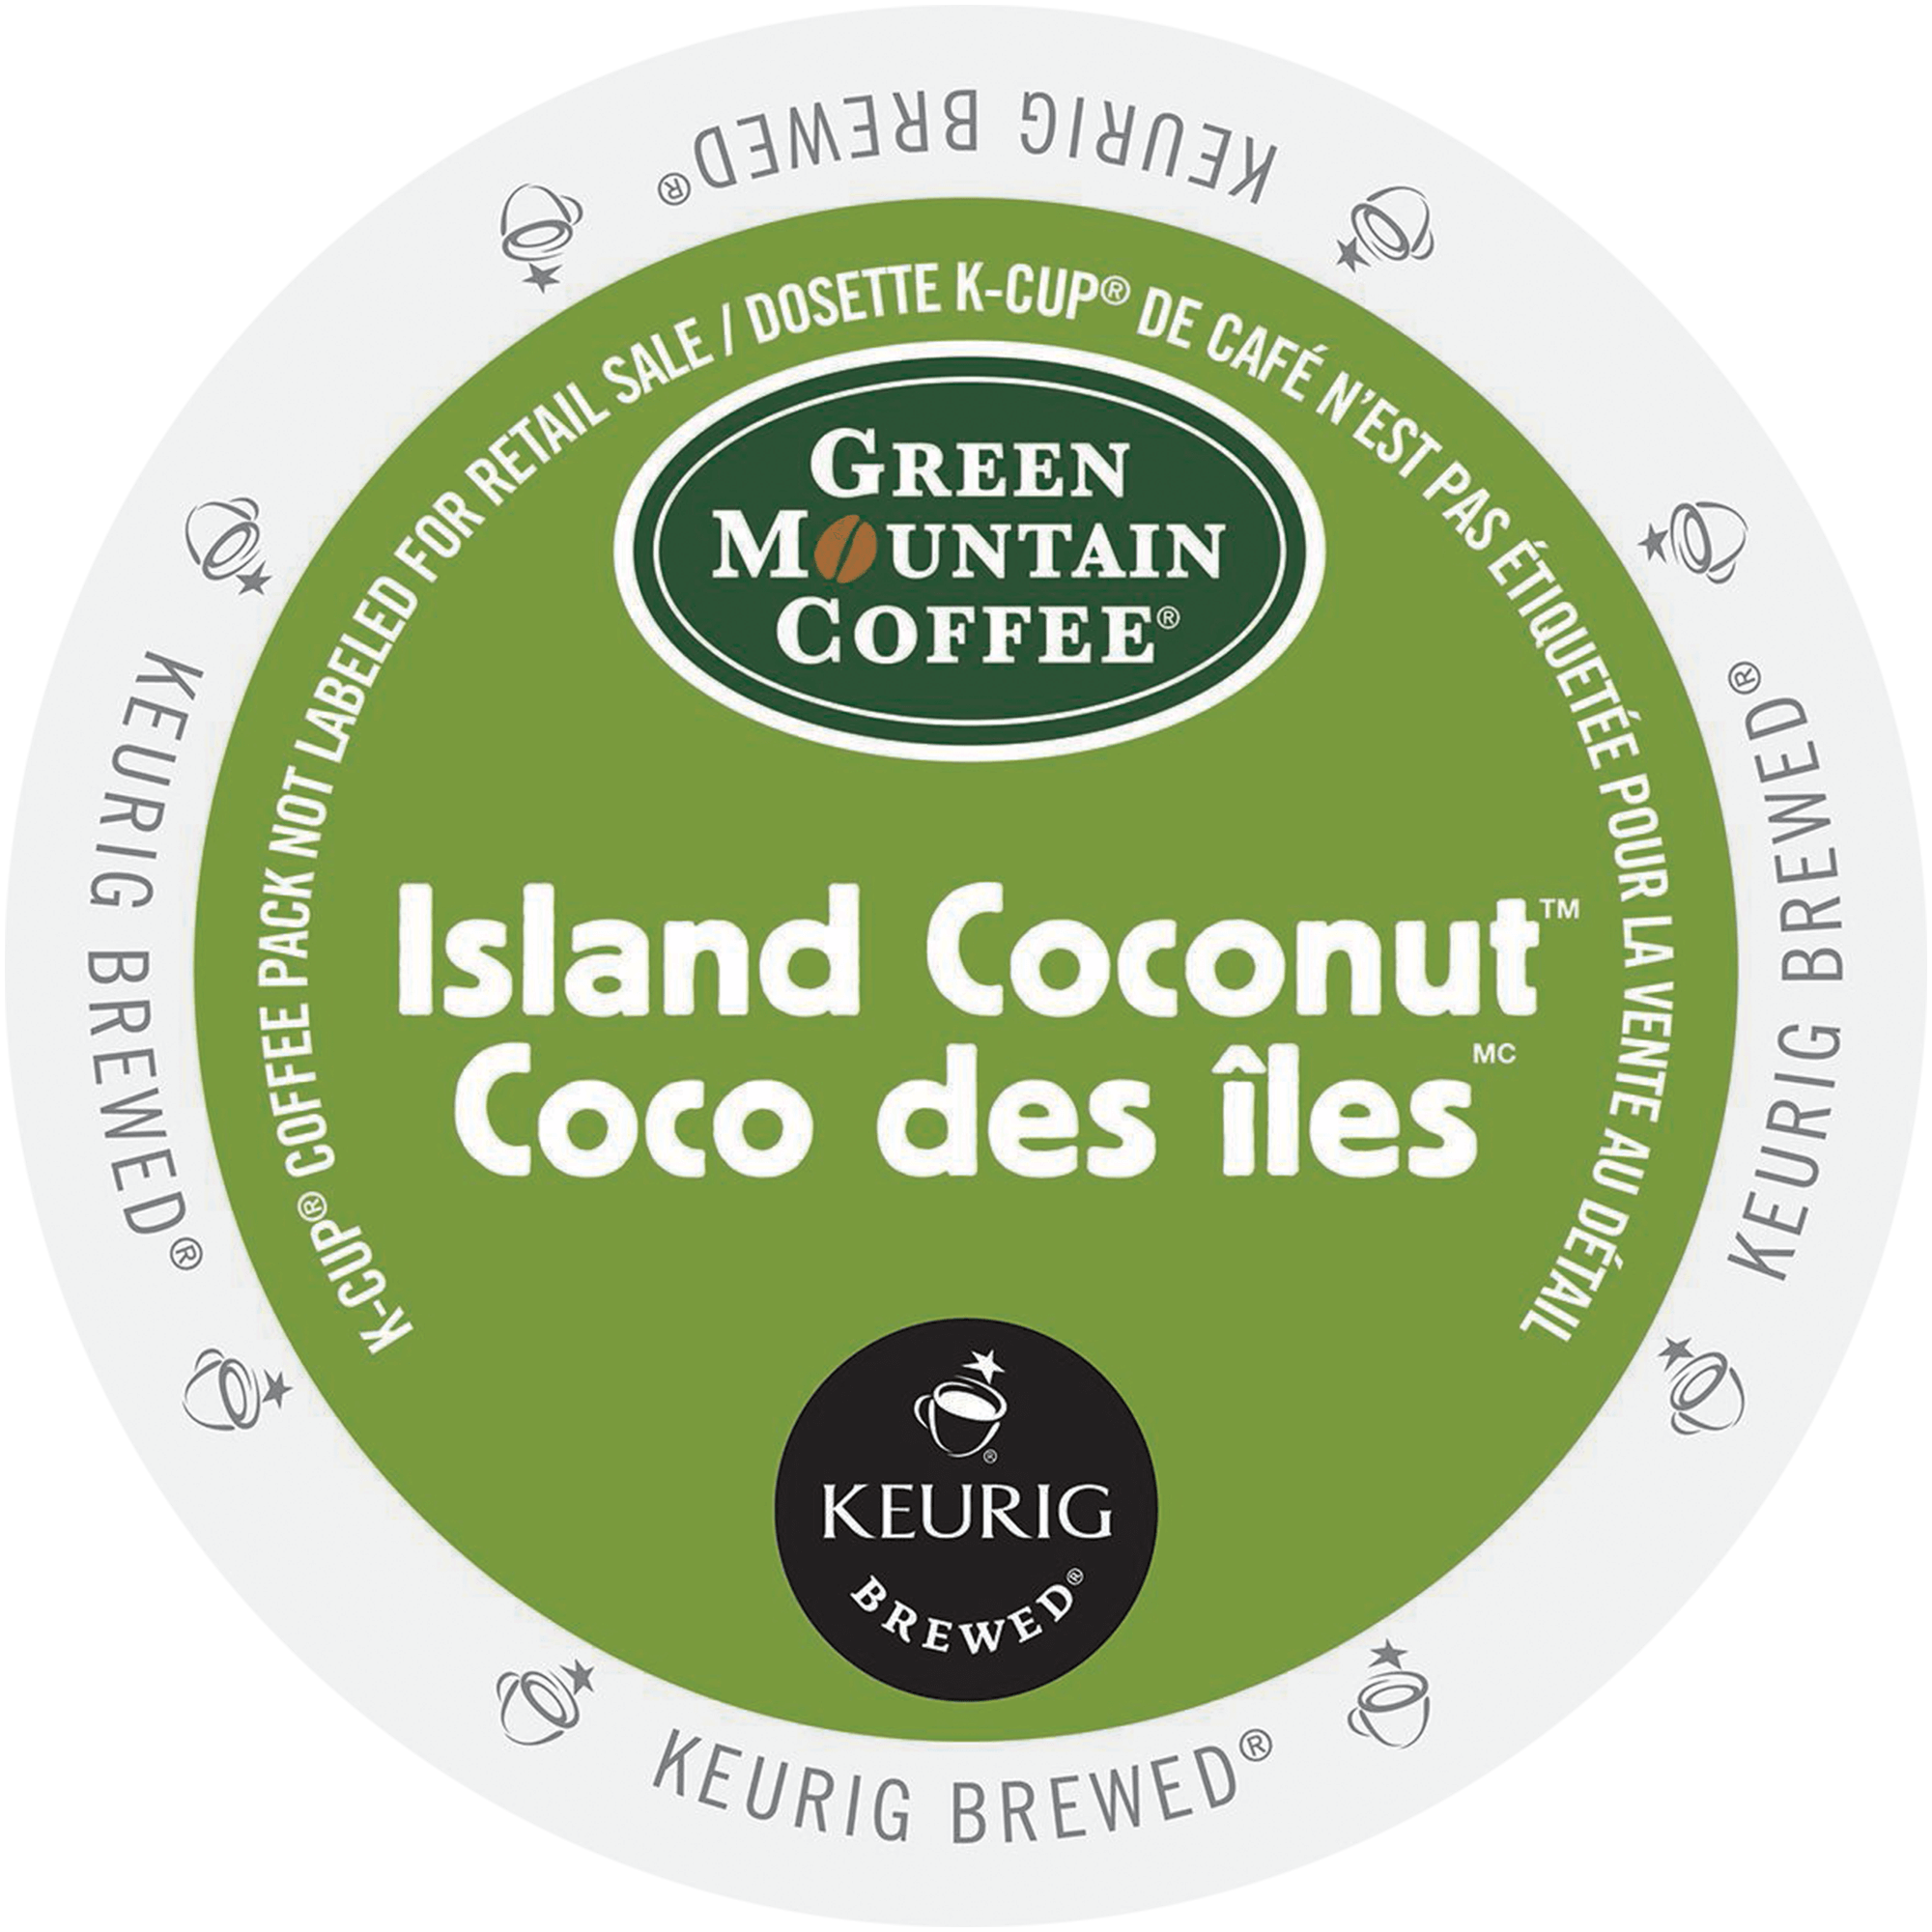 island-coconut-coffee-green-mountain-coffee-k-cup_ca_general